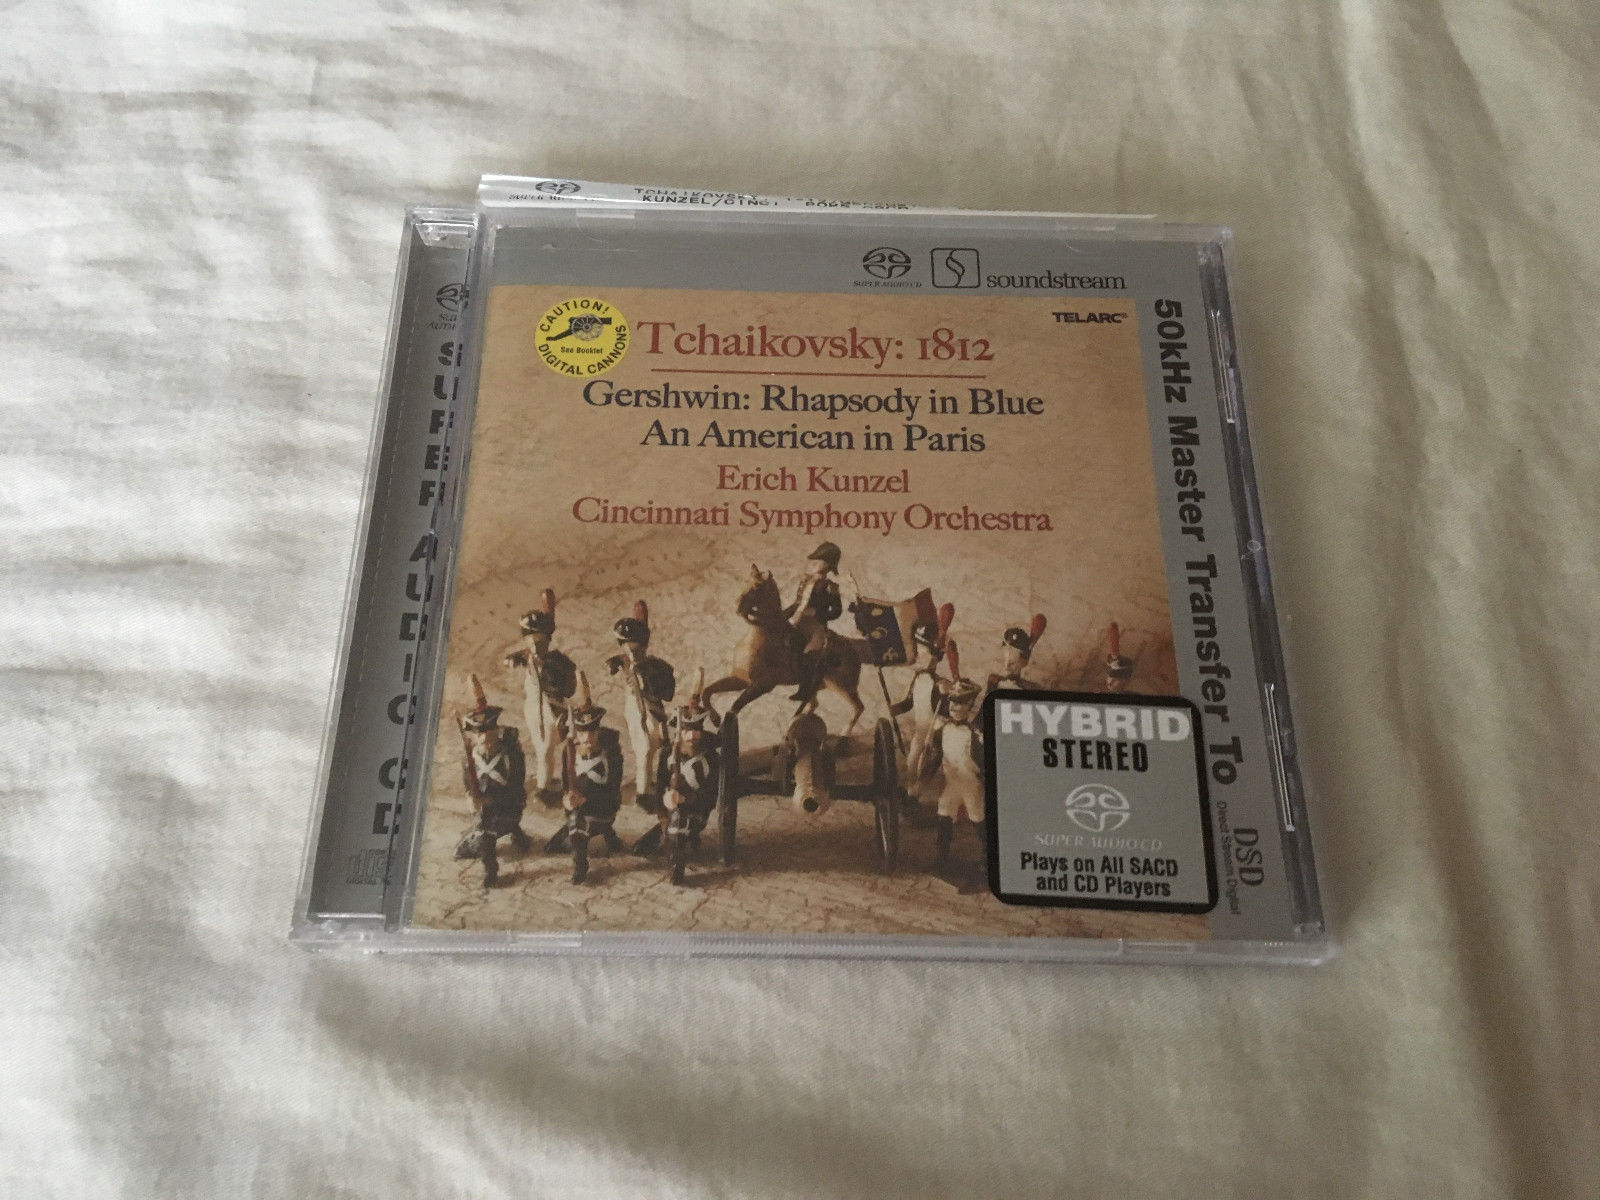 Tchaikovsky: 1812; Gershwin: Rhapsody in Blue; An American in Paris Super...